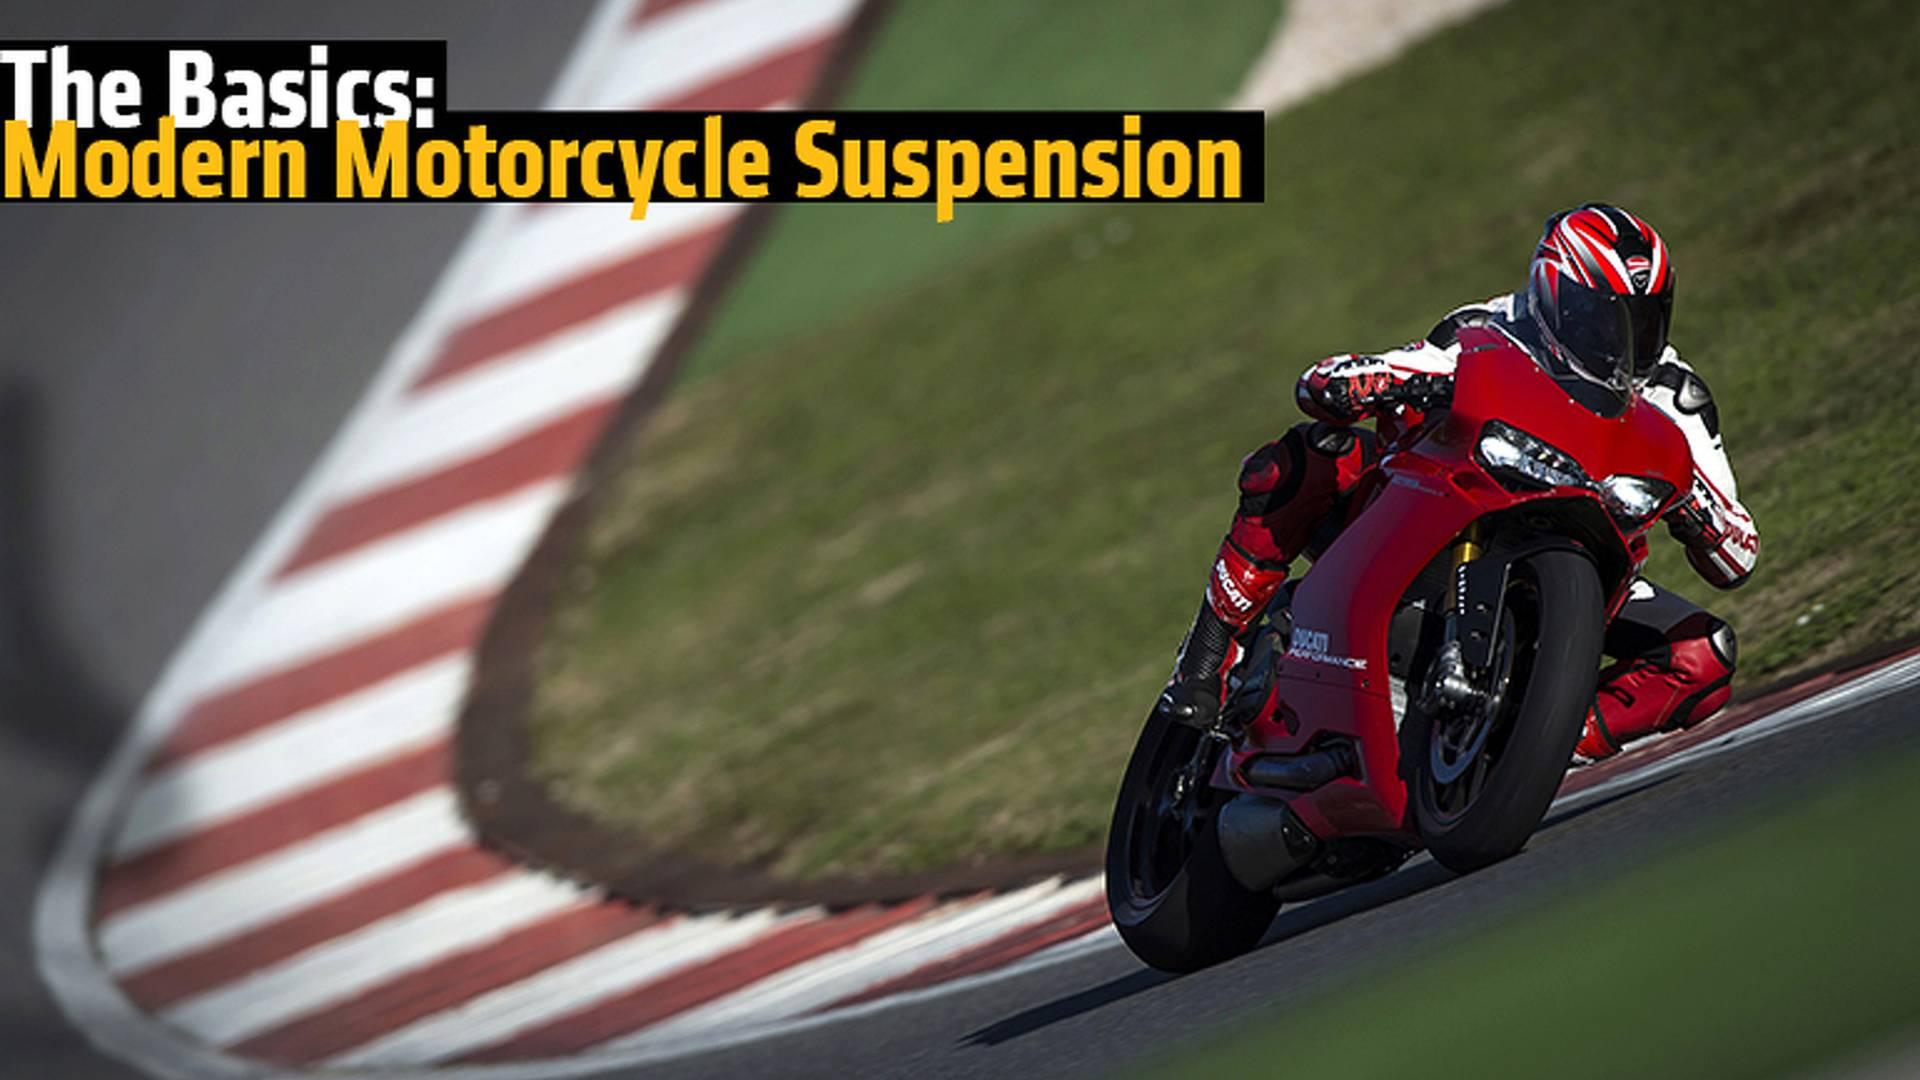 The Basics: Modern Motorcycle Suspension